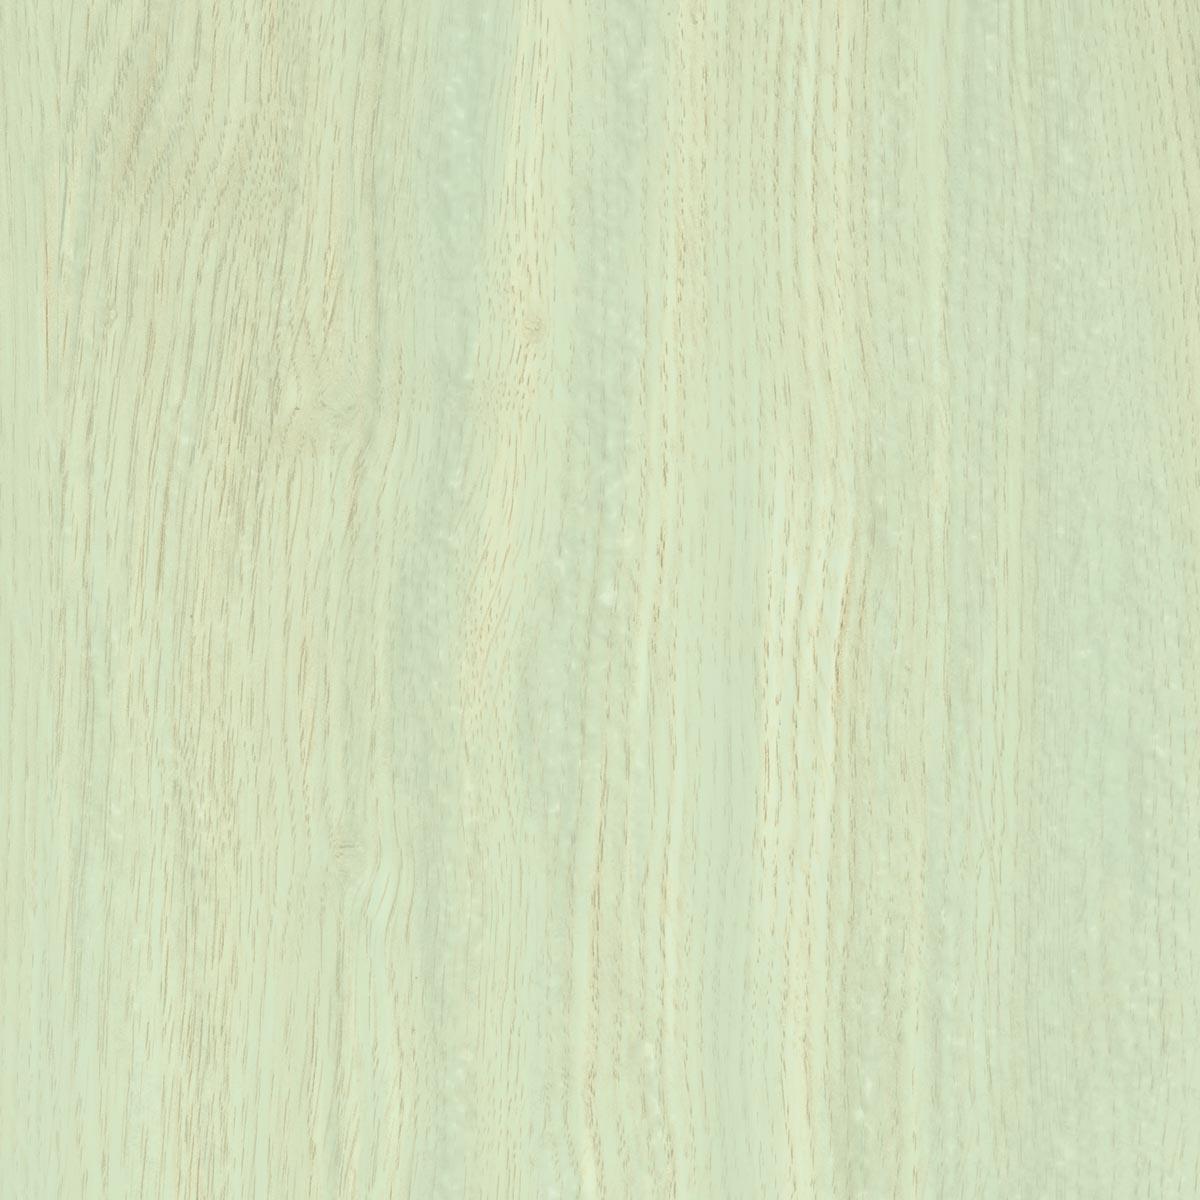 FolkArt ® Pickling Wash™ - Celadon, 8 oz.